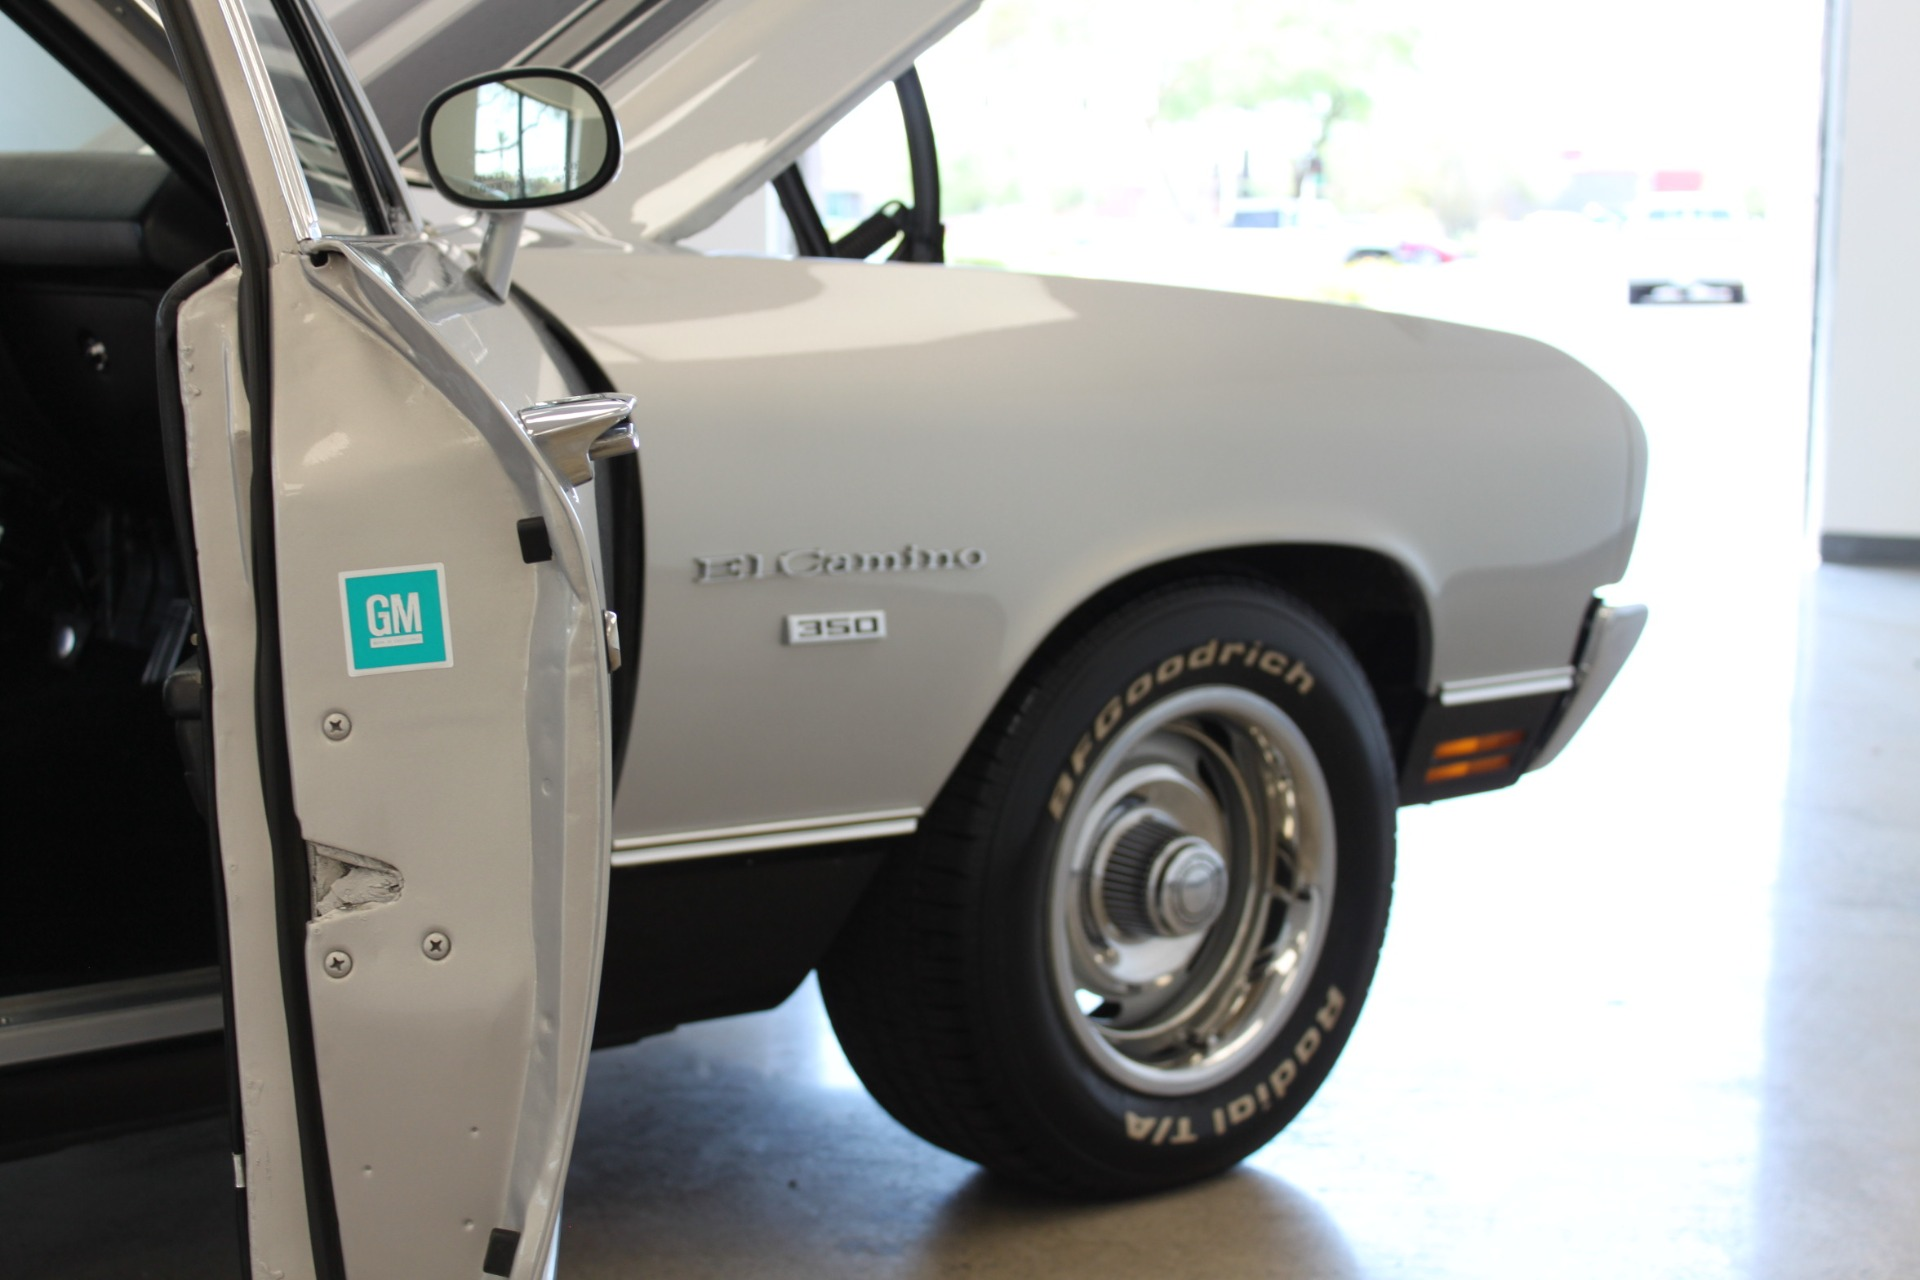 Used-1970-Chevrolet-El-Camino-Custom-350-ci-Land-Rover